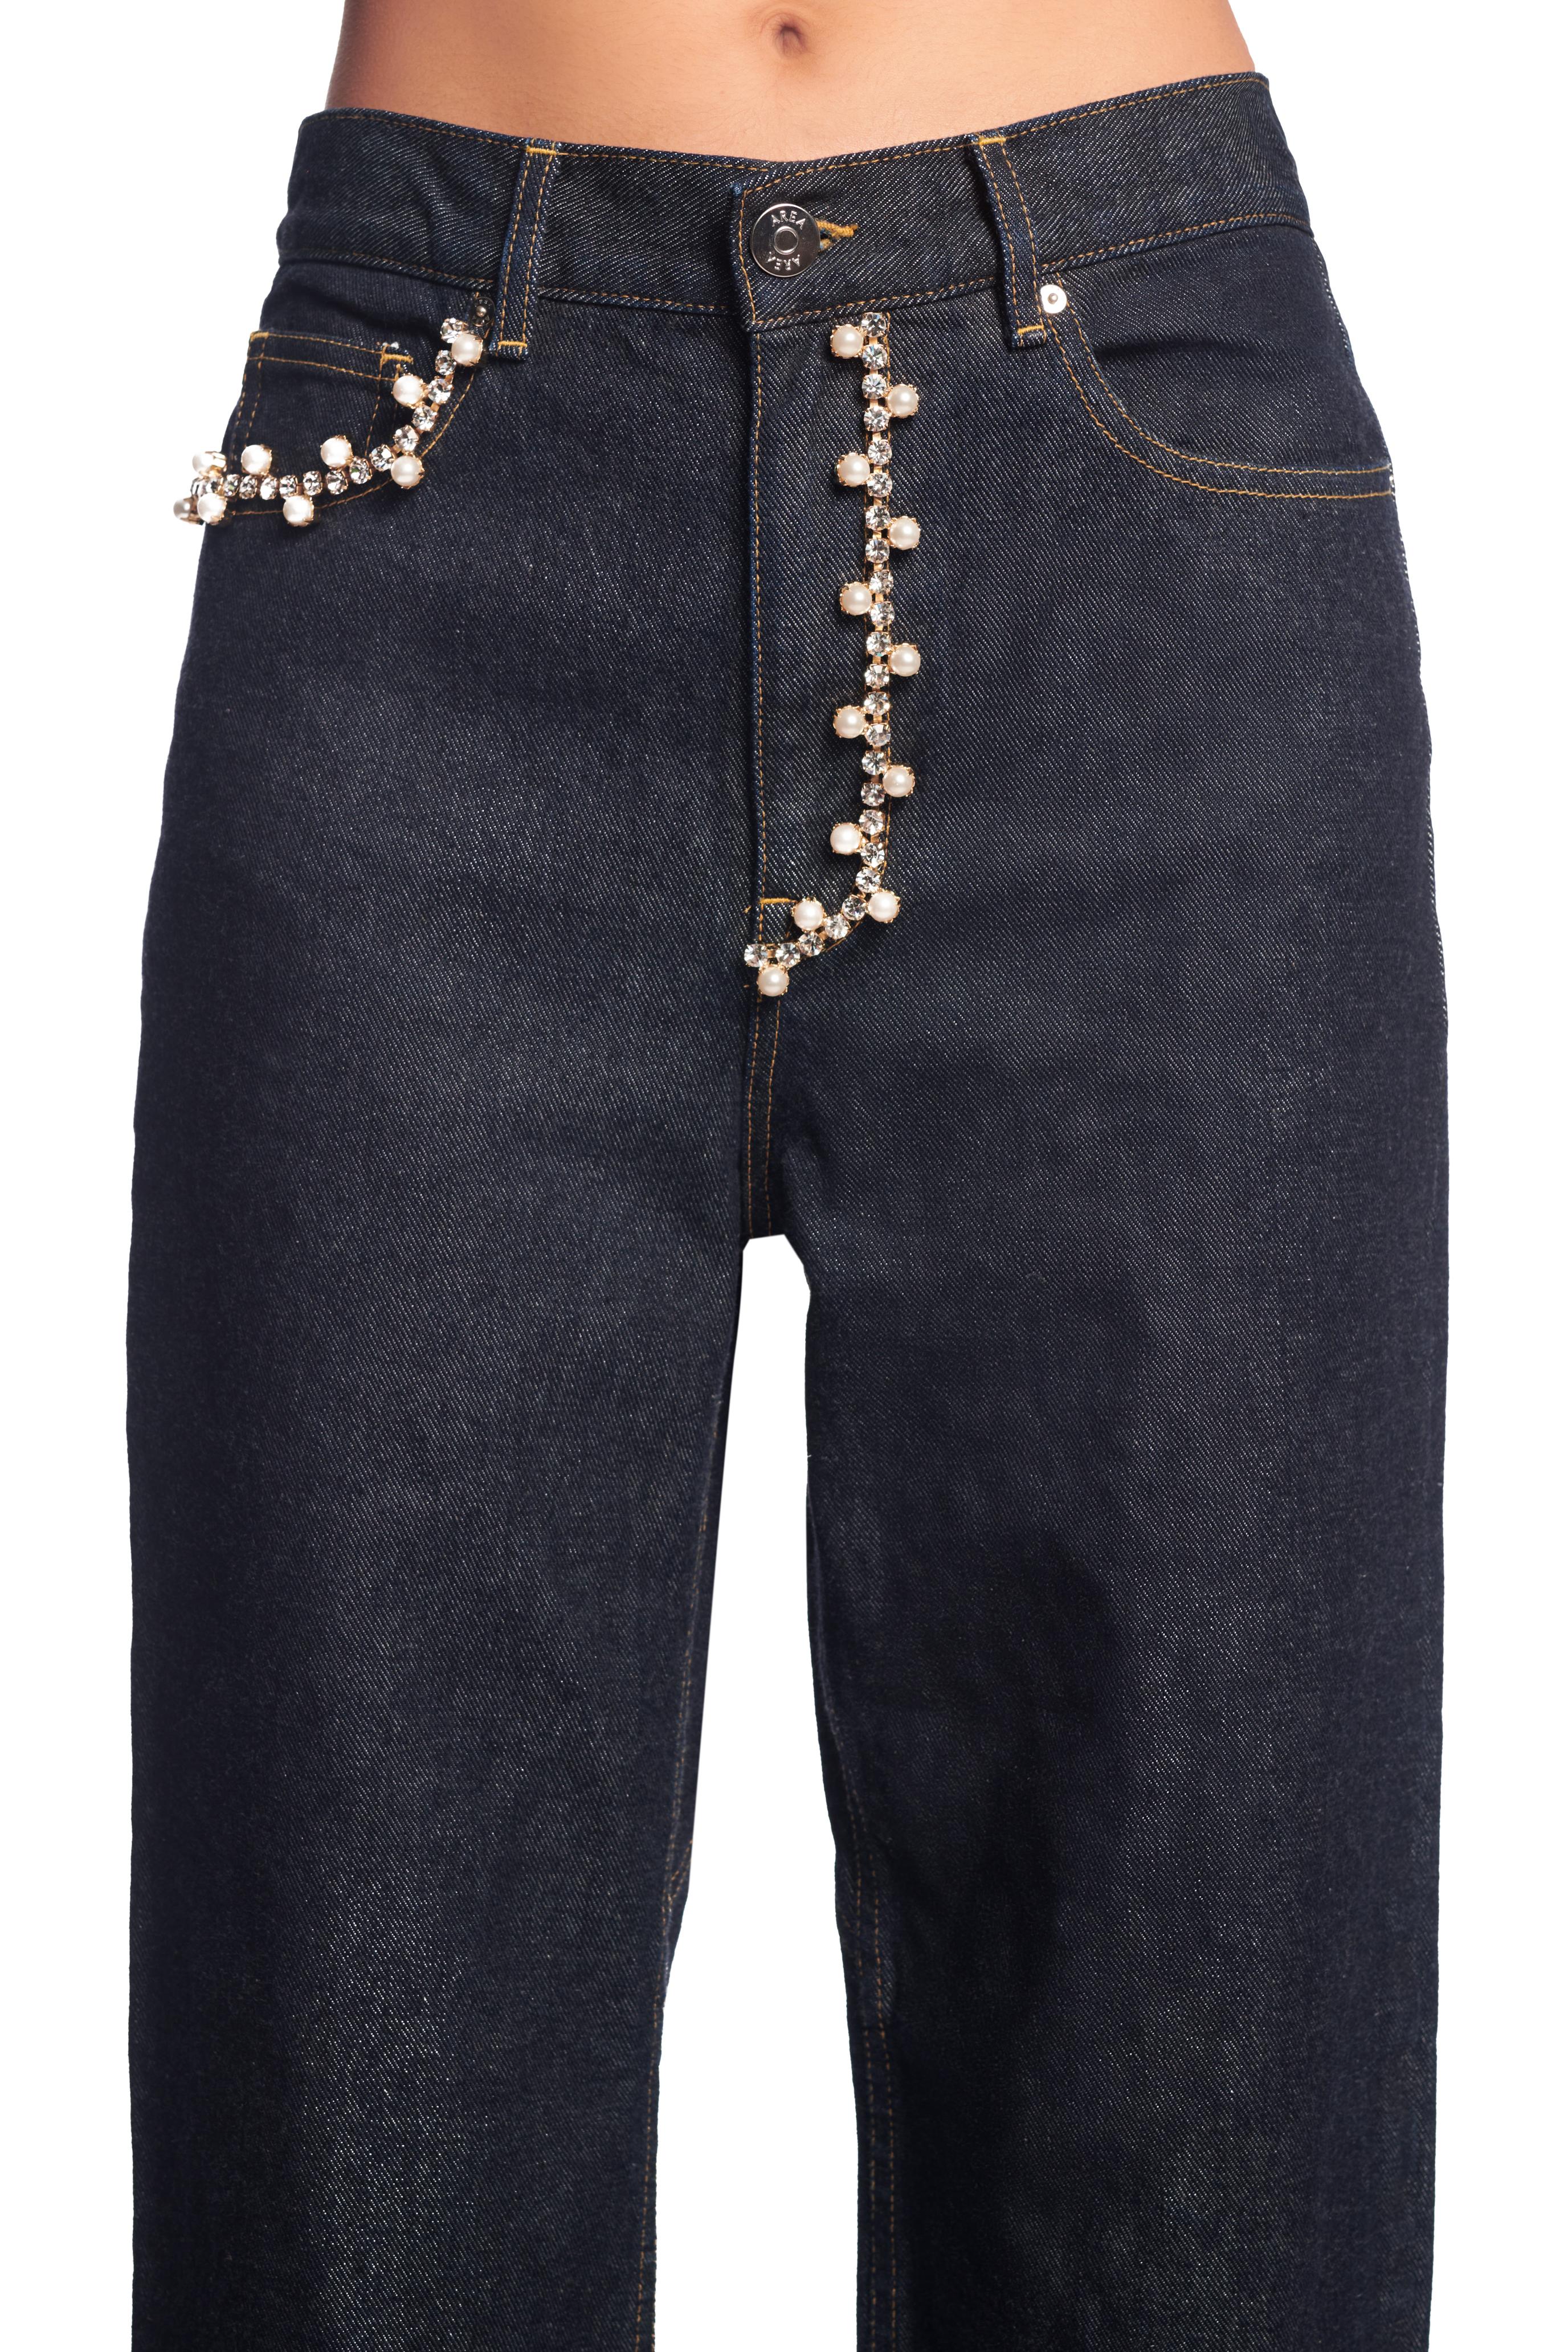 Crystal Pearl Five Pocket Jean